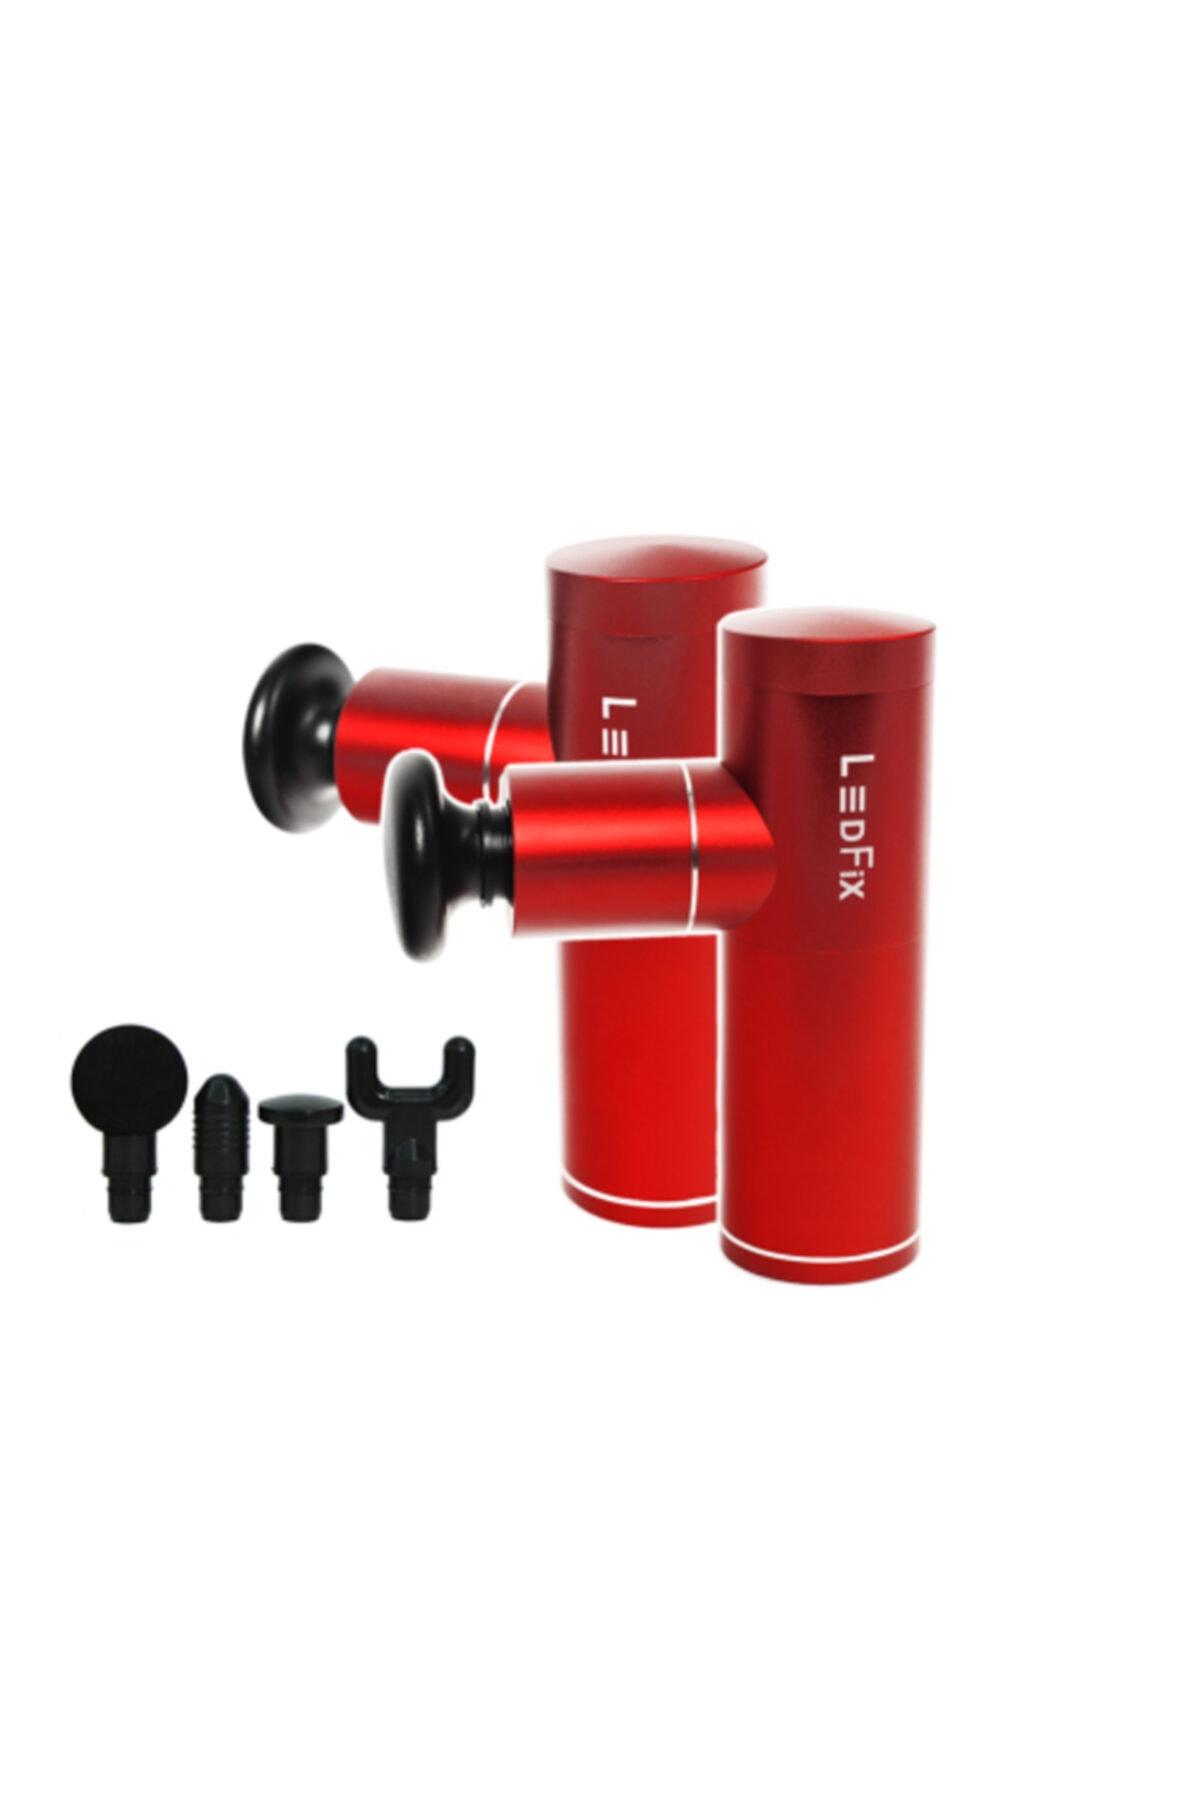 LEDFİX Ledfix Güçlendirilmiş Masaj Aleti Kırmızı 1